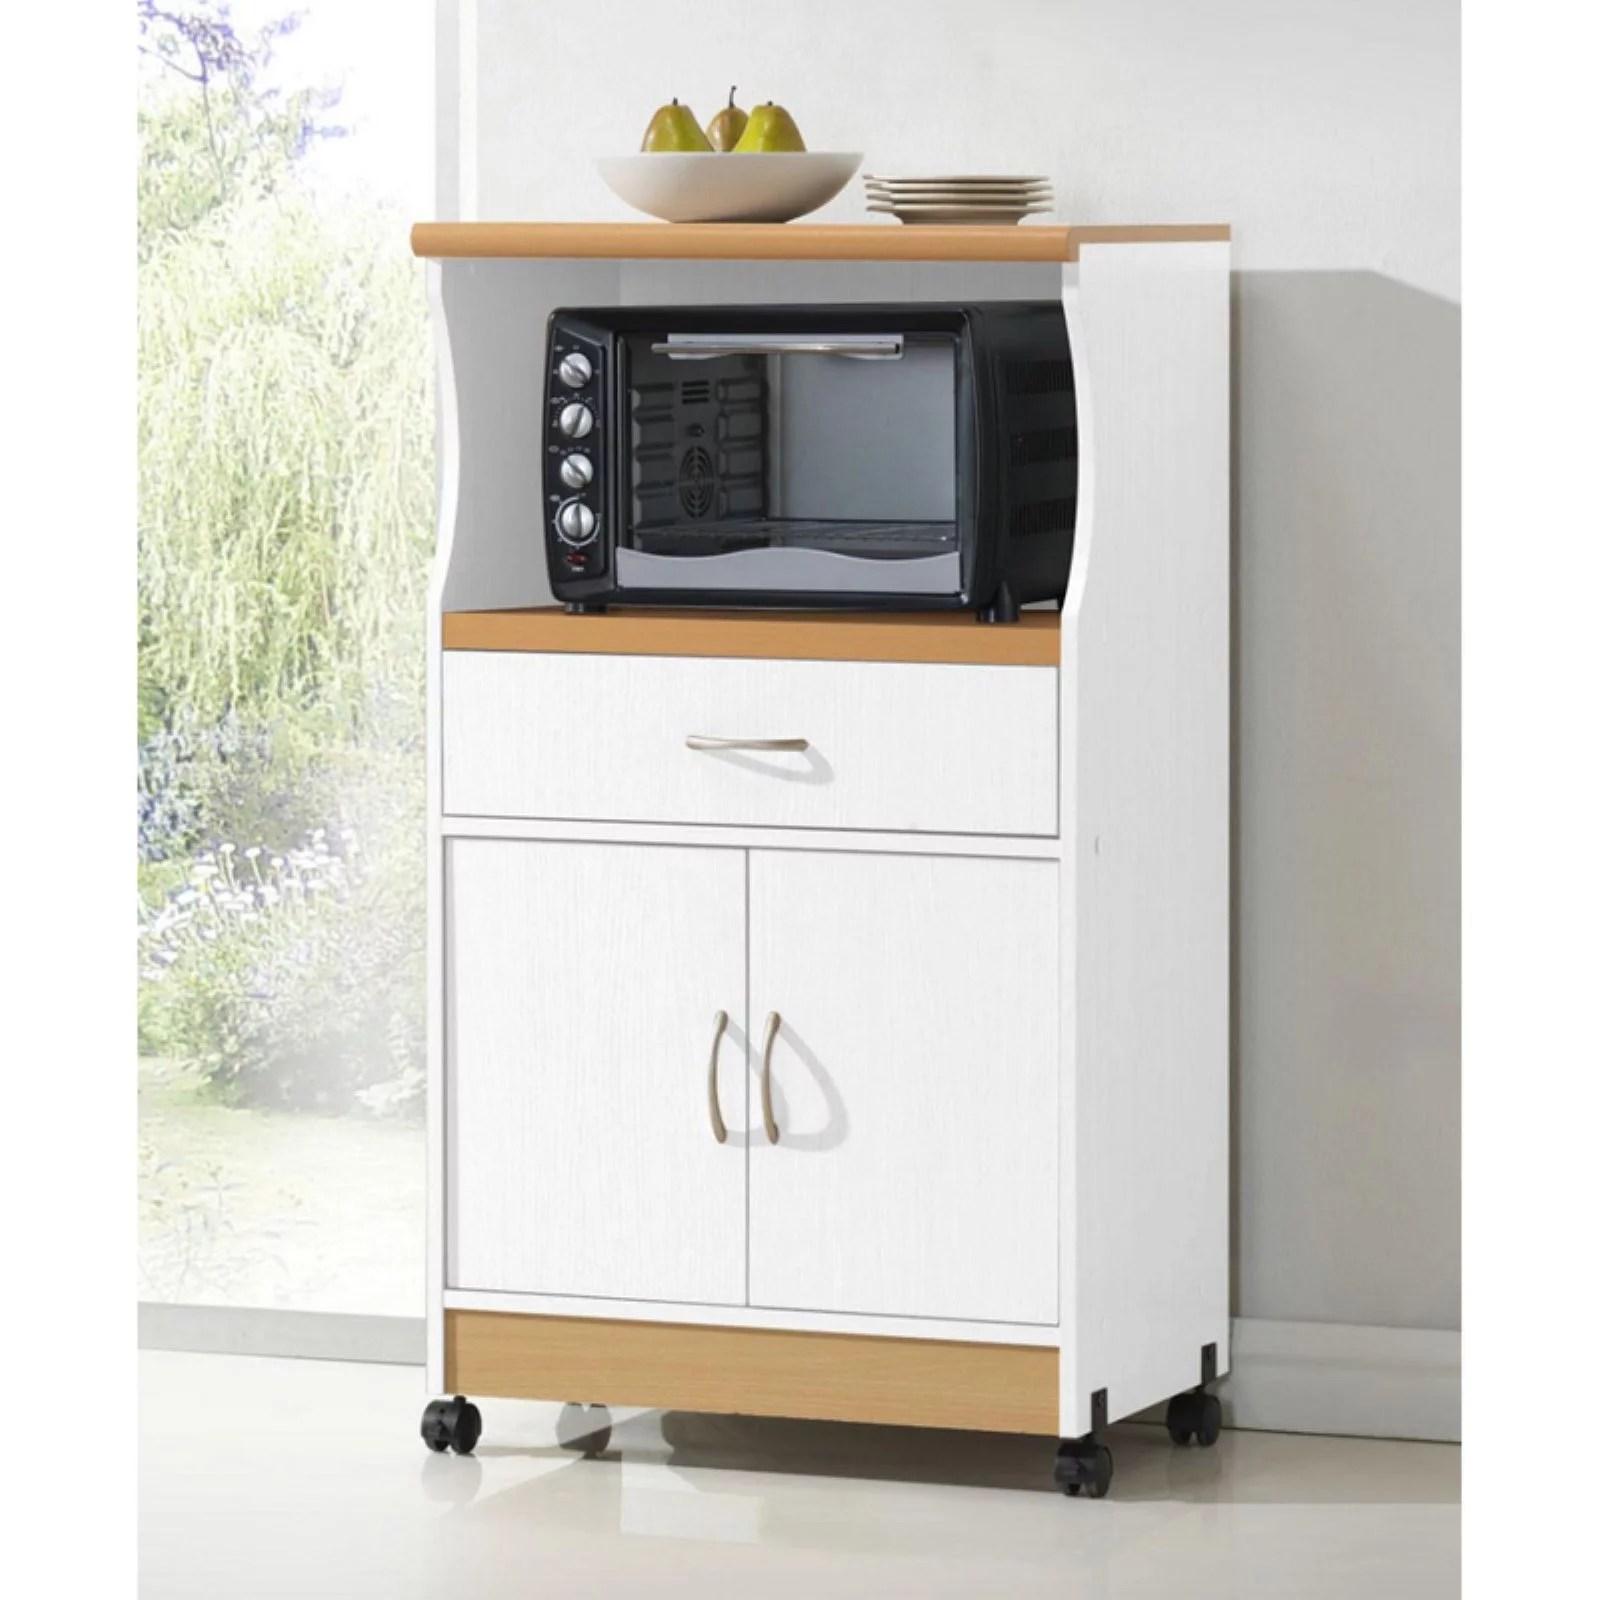 hodedah hik77 microwave cart walmart com